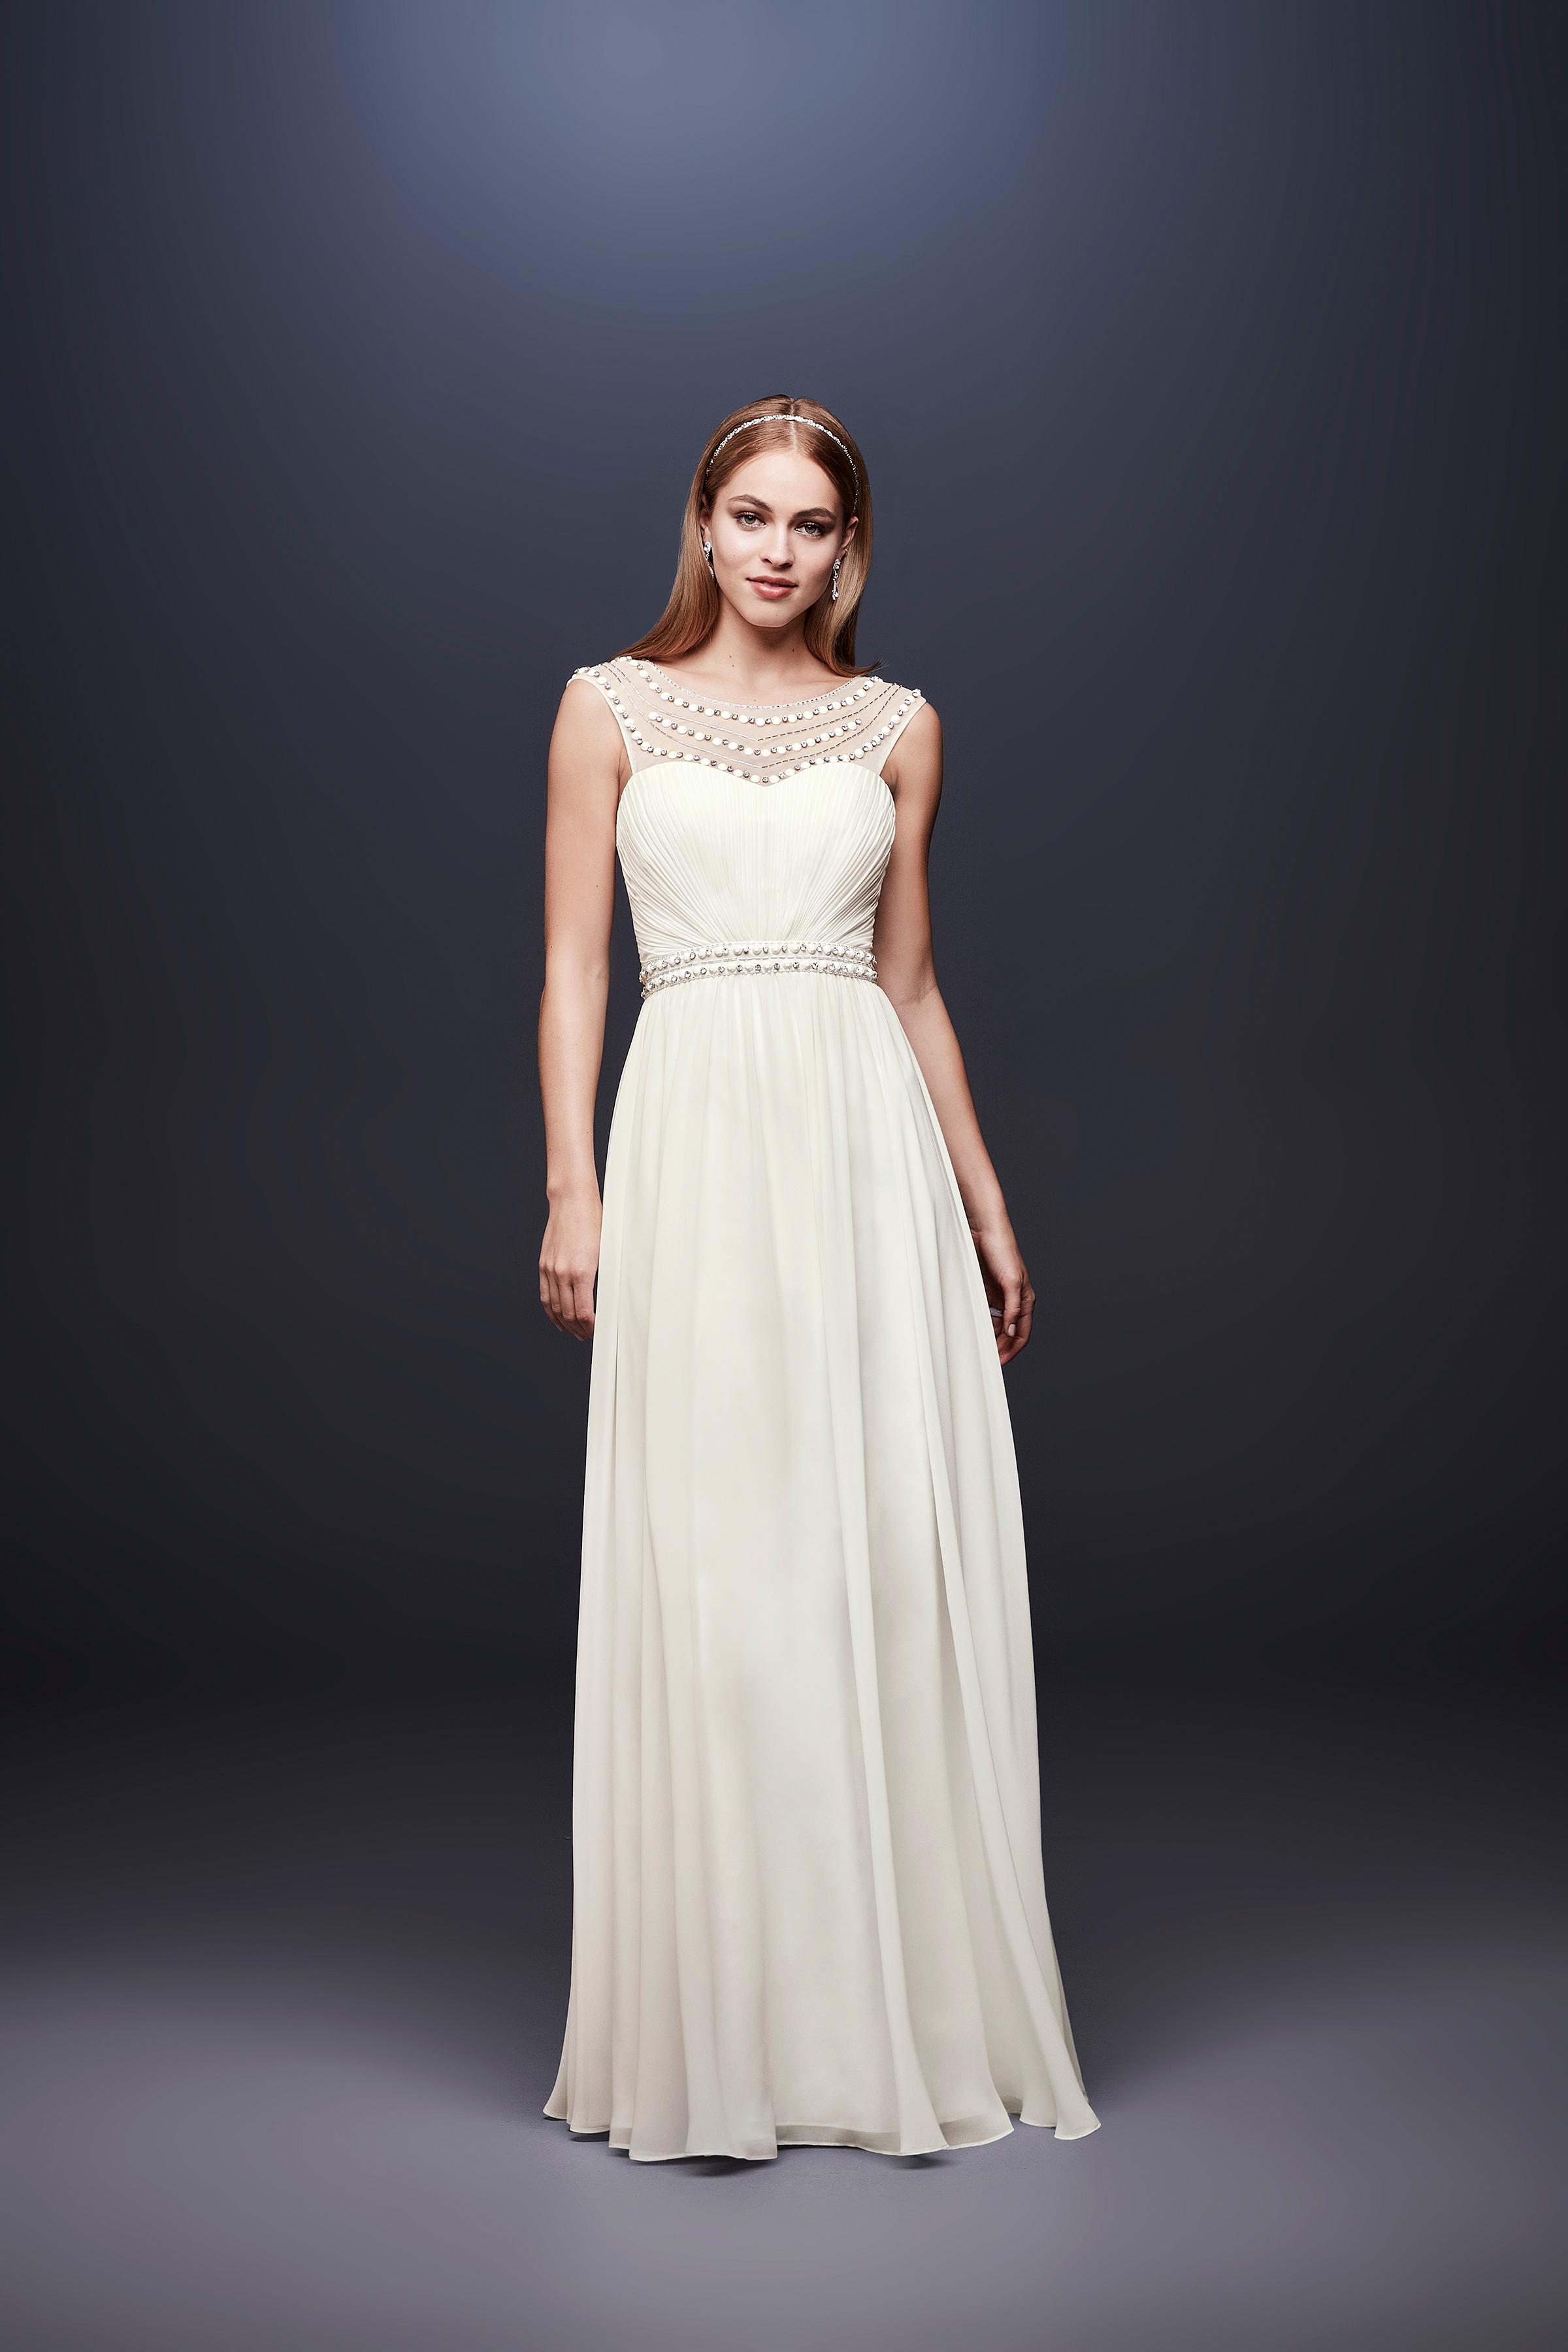 david bridal wedding dress spring 2019 sleeveless sweatheart a-line